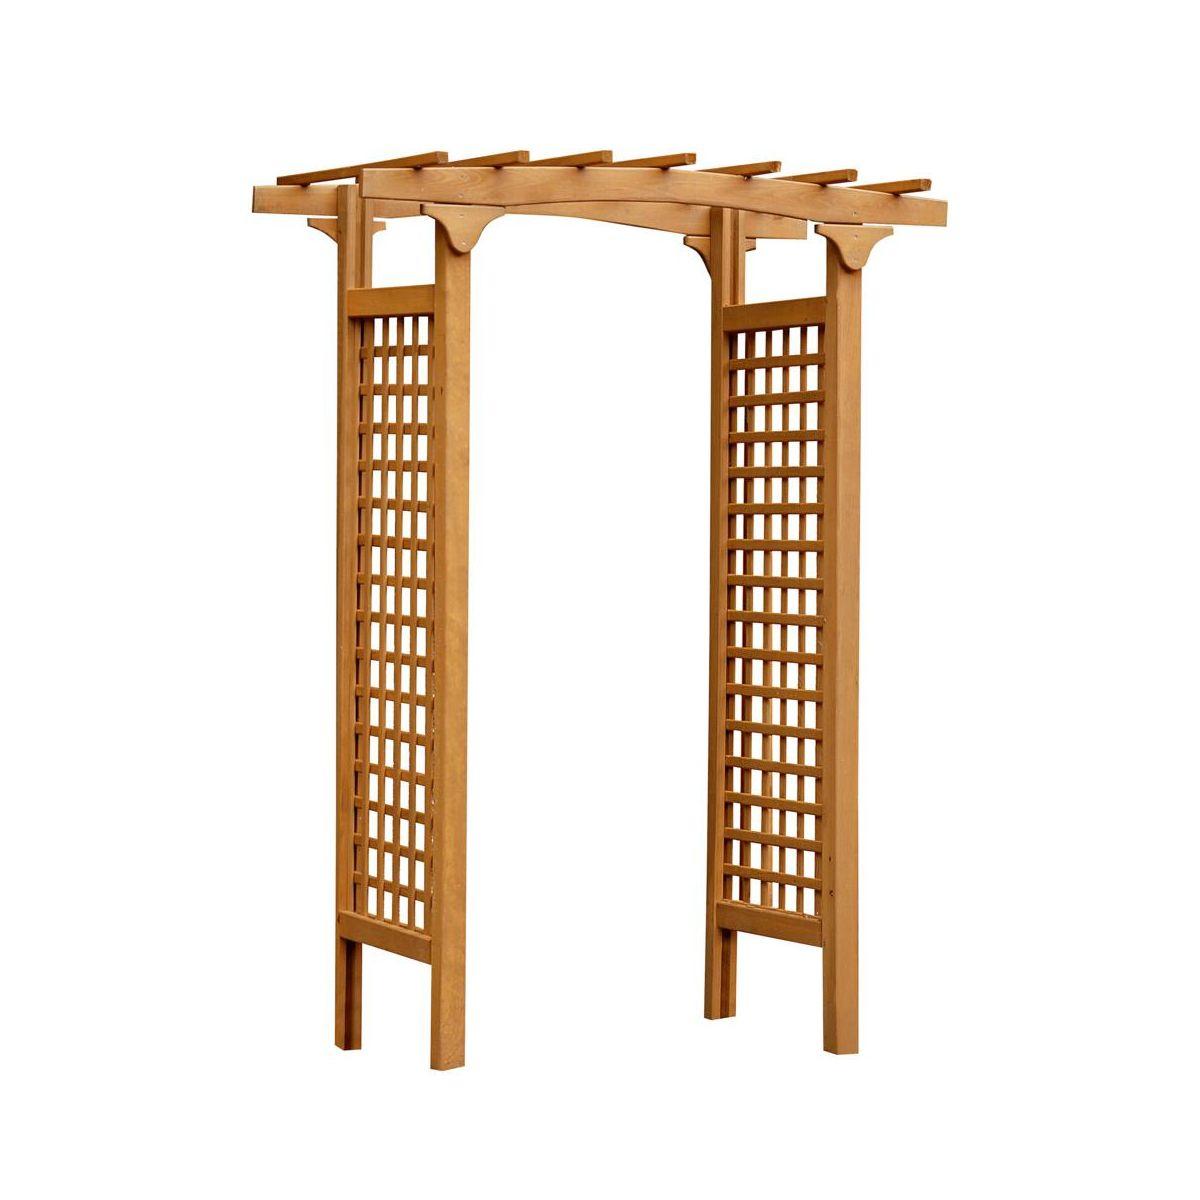 Pergola Ogrodowa 150 X 100 X 218 Cm Drewniana Malva Werth-Holz concernant Pergola Leroy Merlin